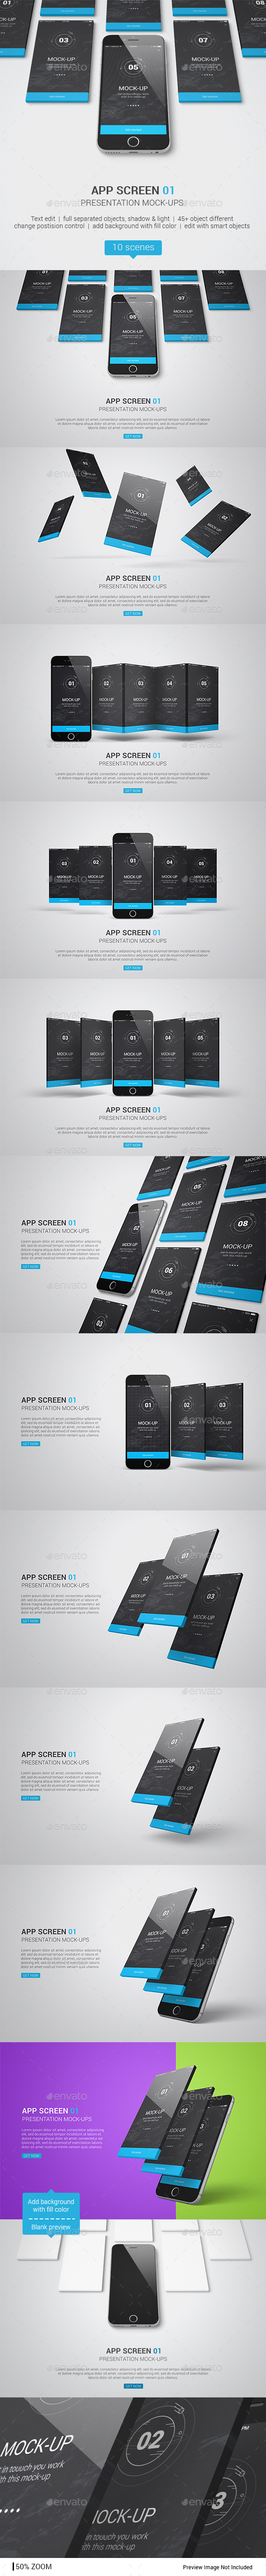 Iphone / UI / App Screen Mockup - Product Mock-Ups Graphics